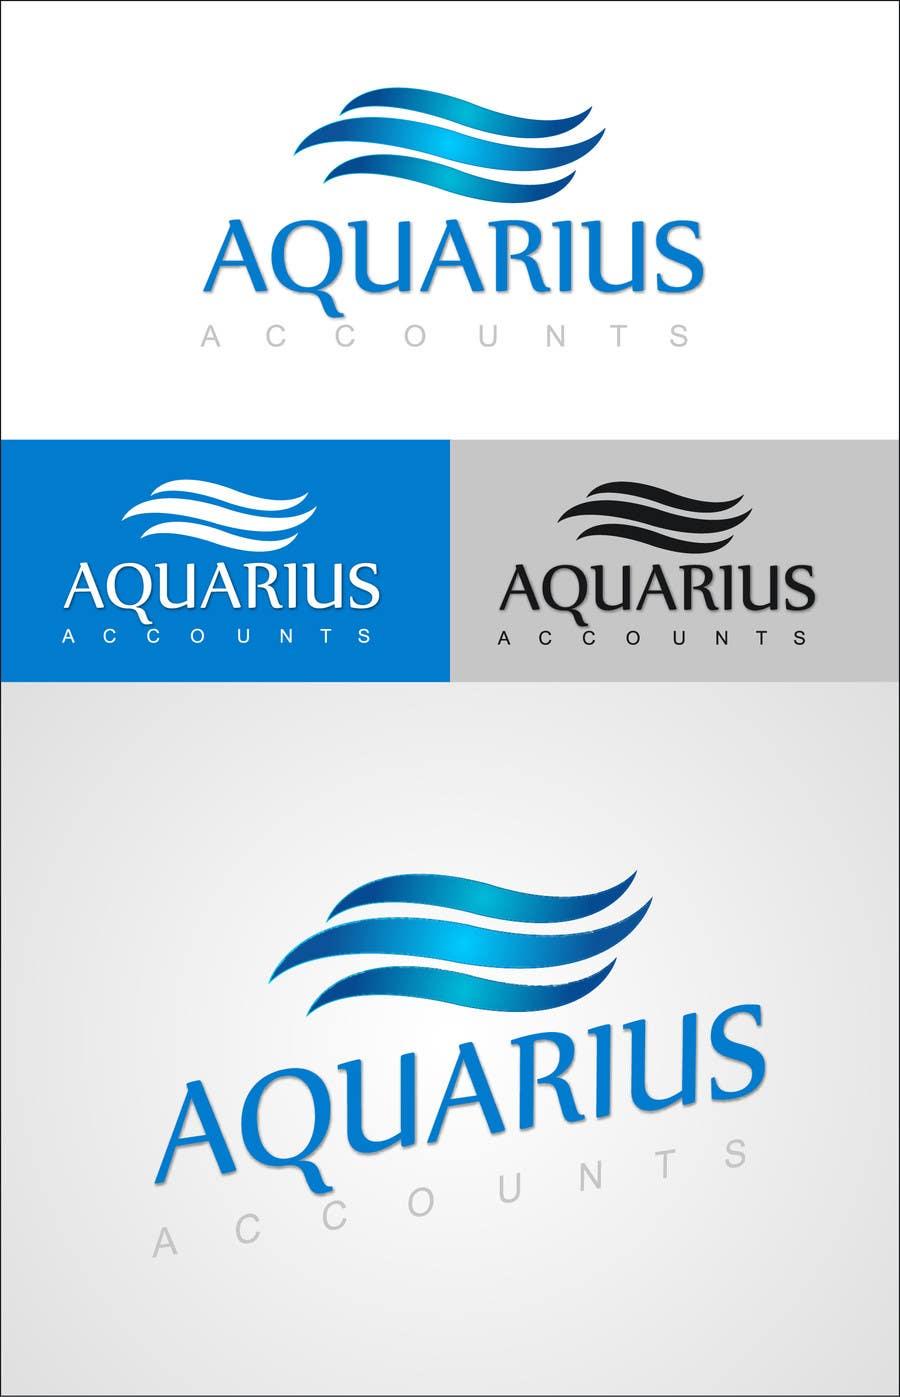 #232 for Design a Logo for Aquarius Accounts by premkumar112